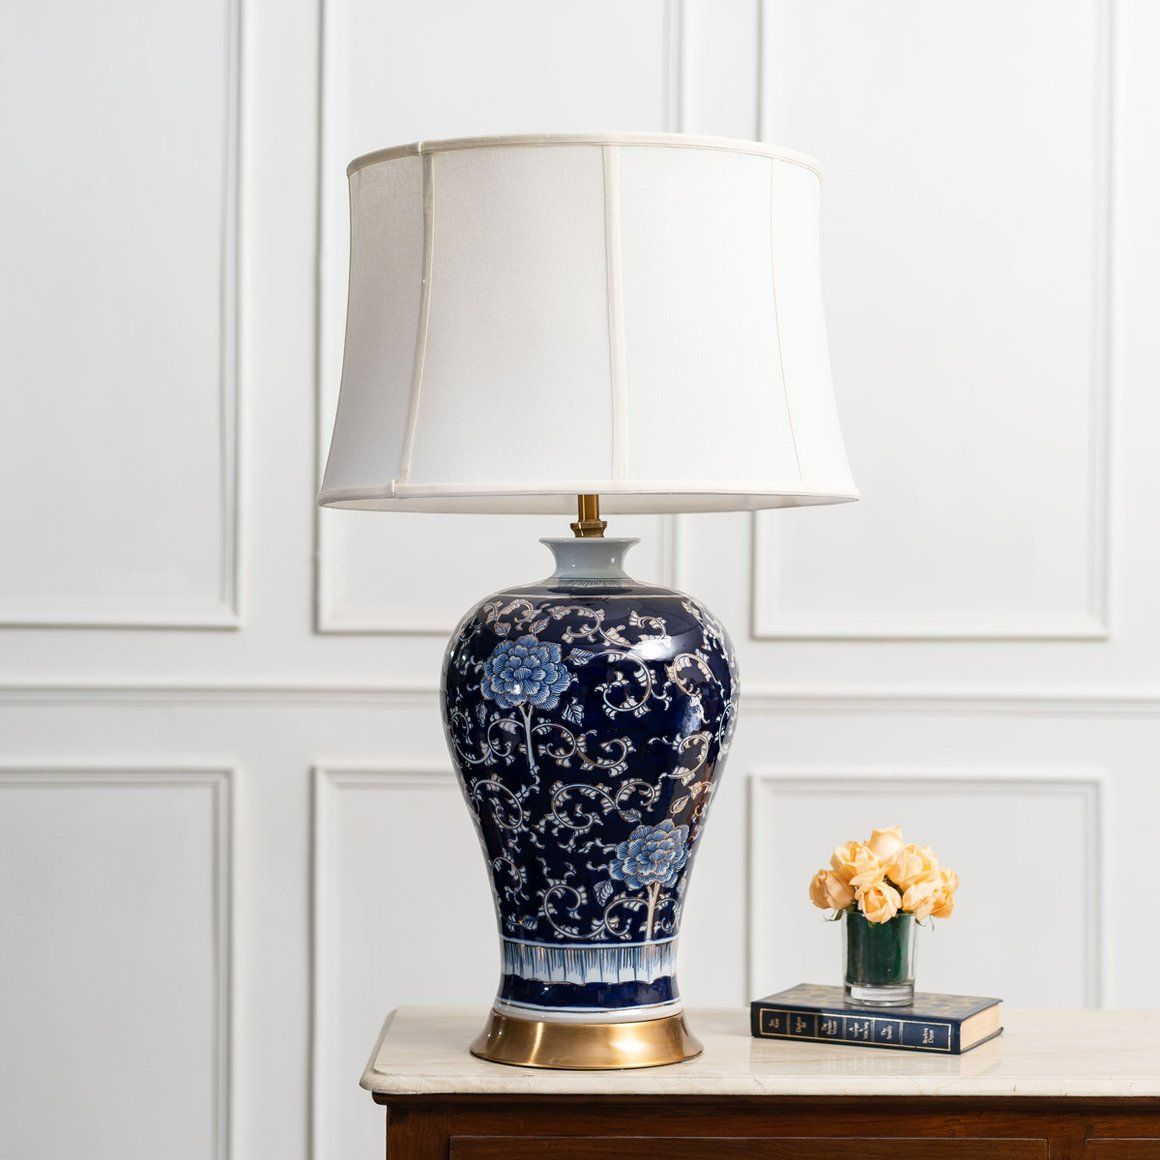 Decadent Ceramic Table Lamp Ceramic Table Lamps Study Lamps Table Lamp